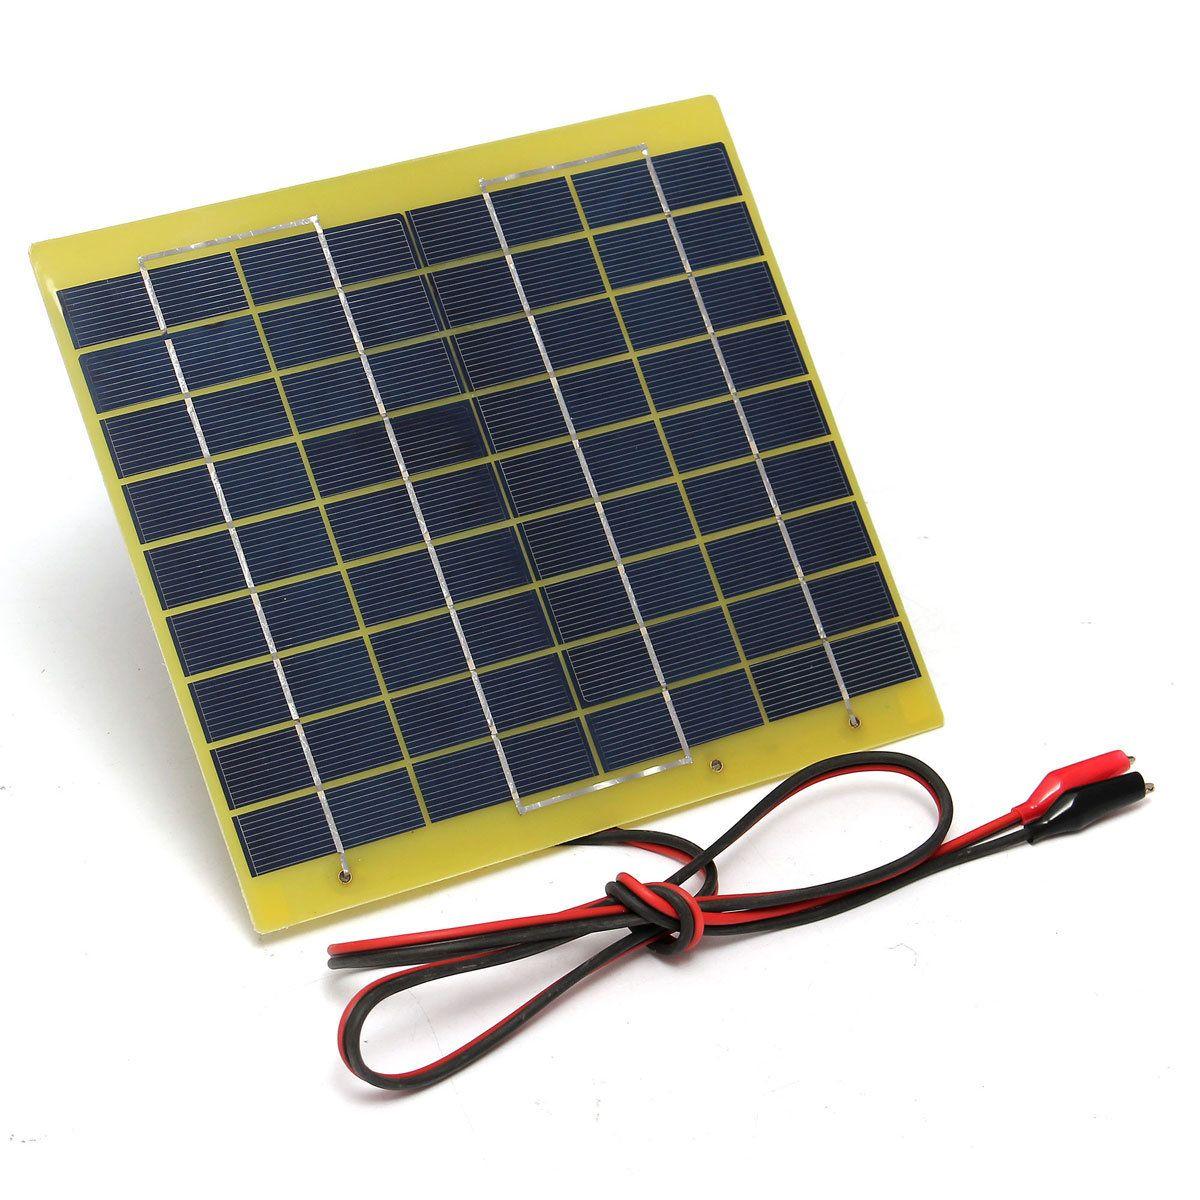 Scm Solar high conversion rate 5w solar panel for 12v solar battery arduino